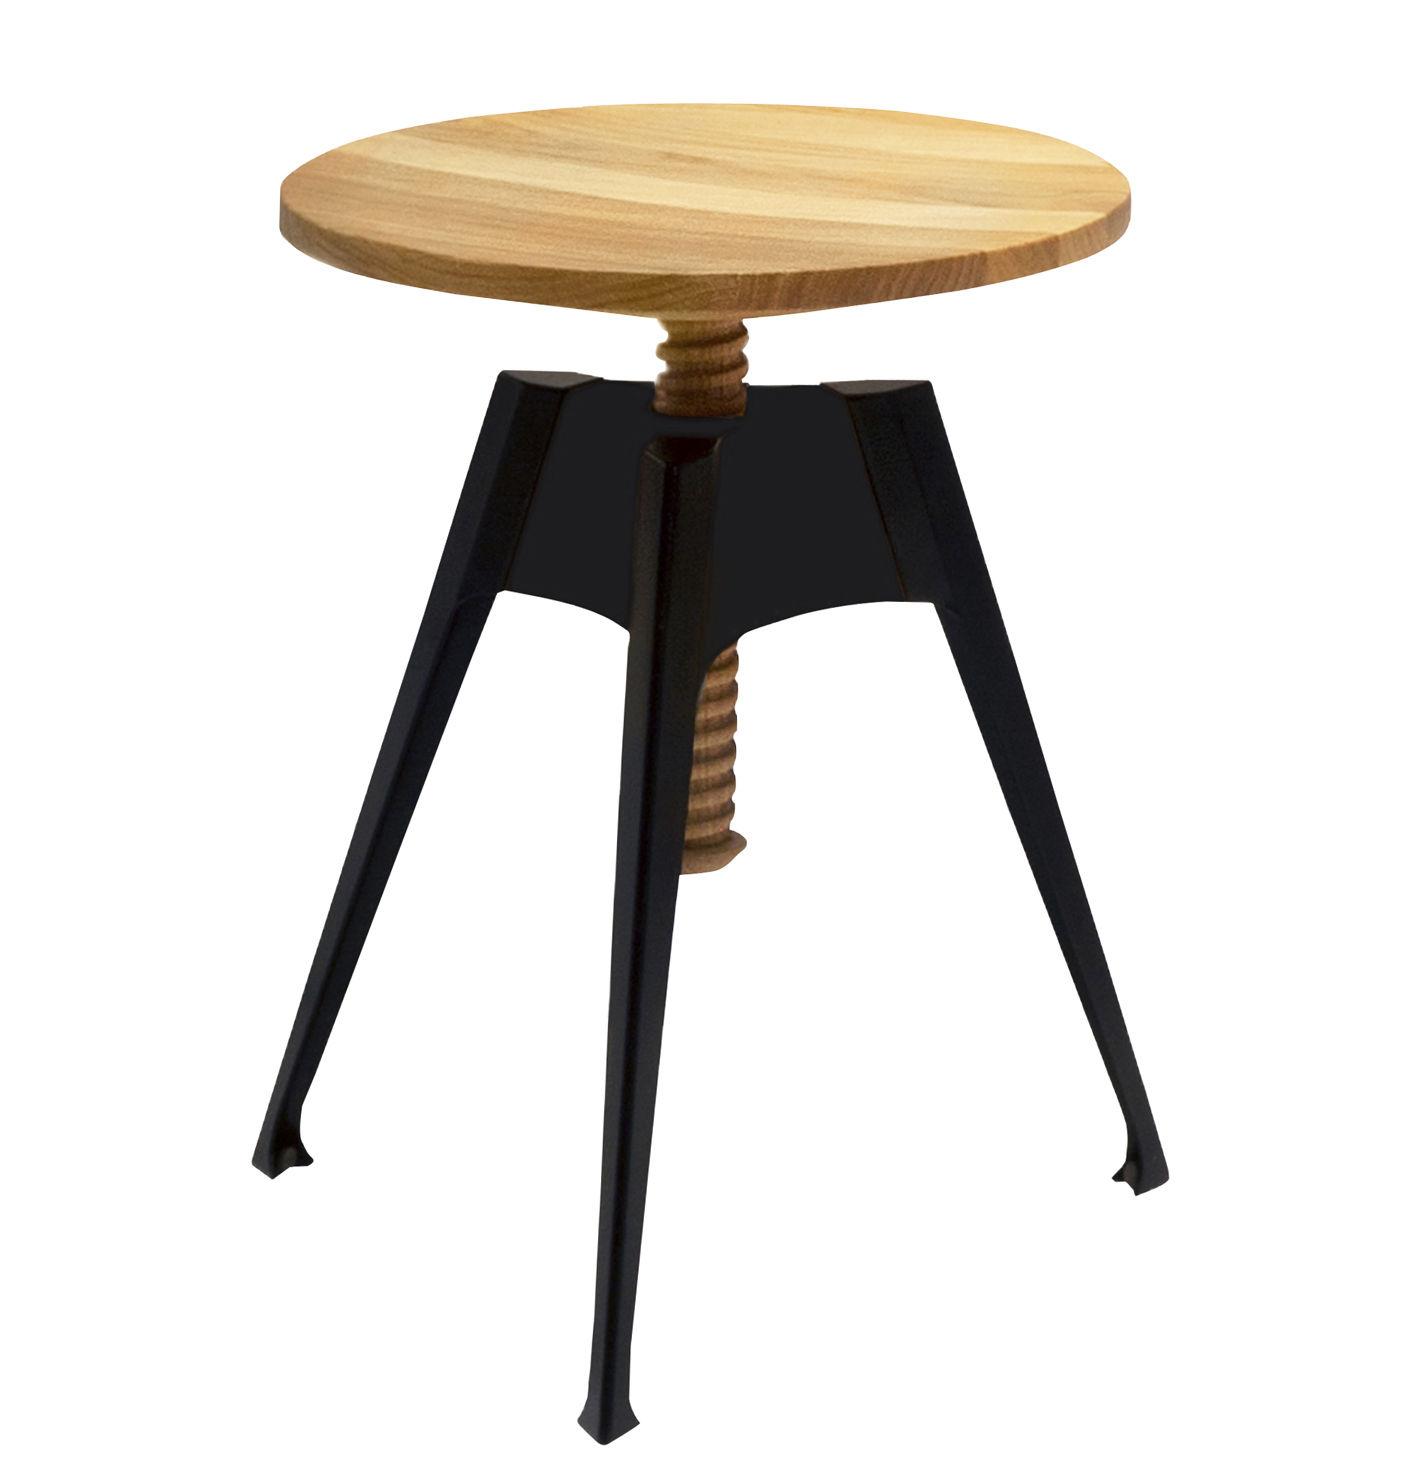 tabouret portable atelier moleskine h 45 60 cm bois noir driade. Black Bedroom Furniture Sets. Home Design Ideas